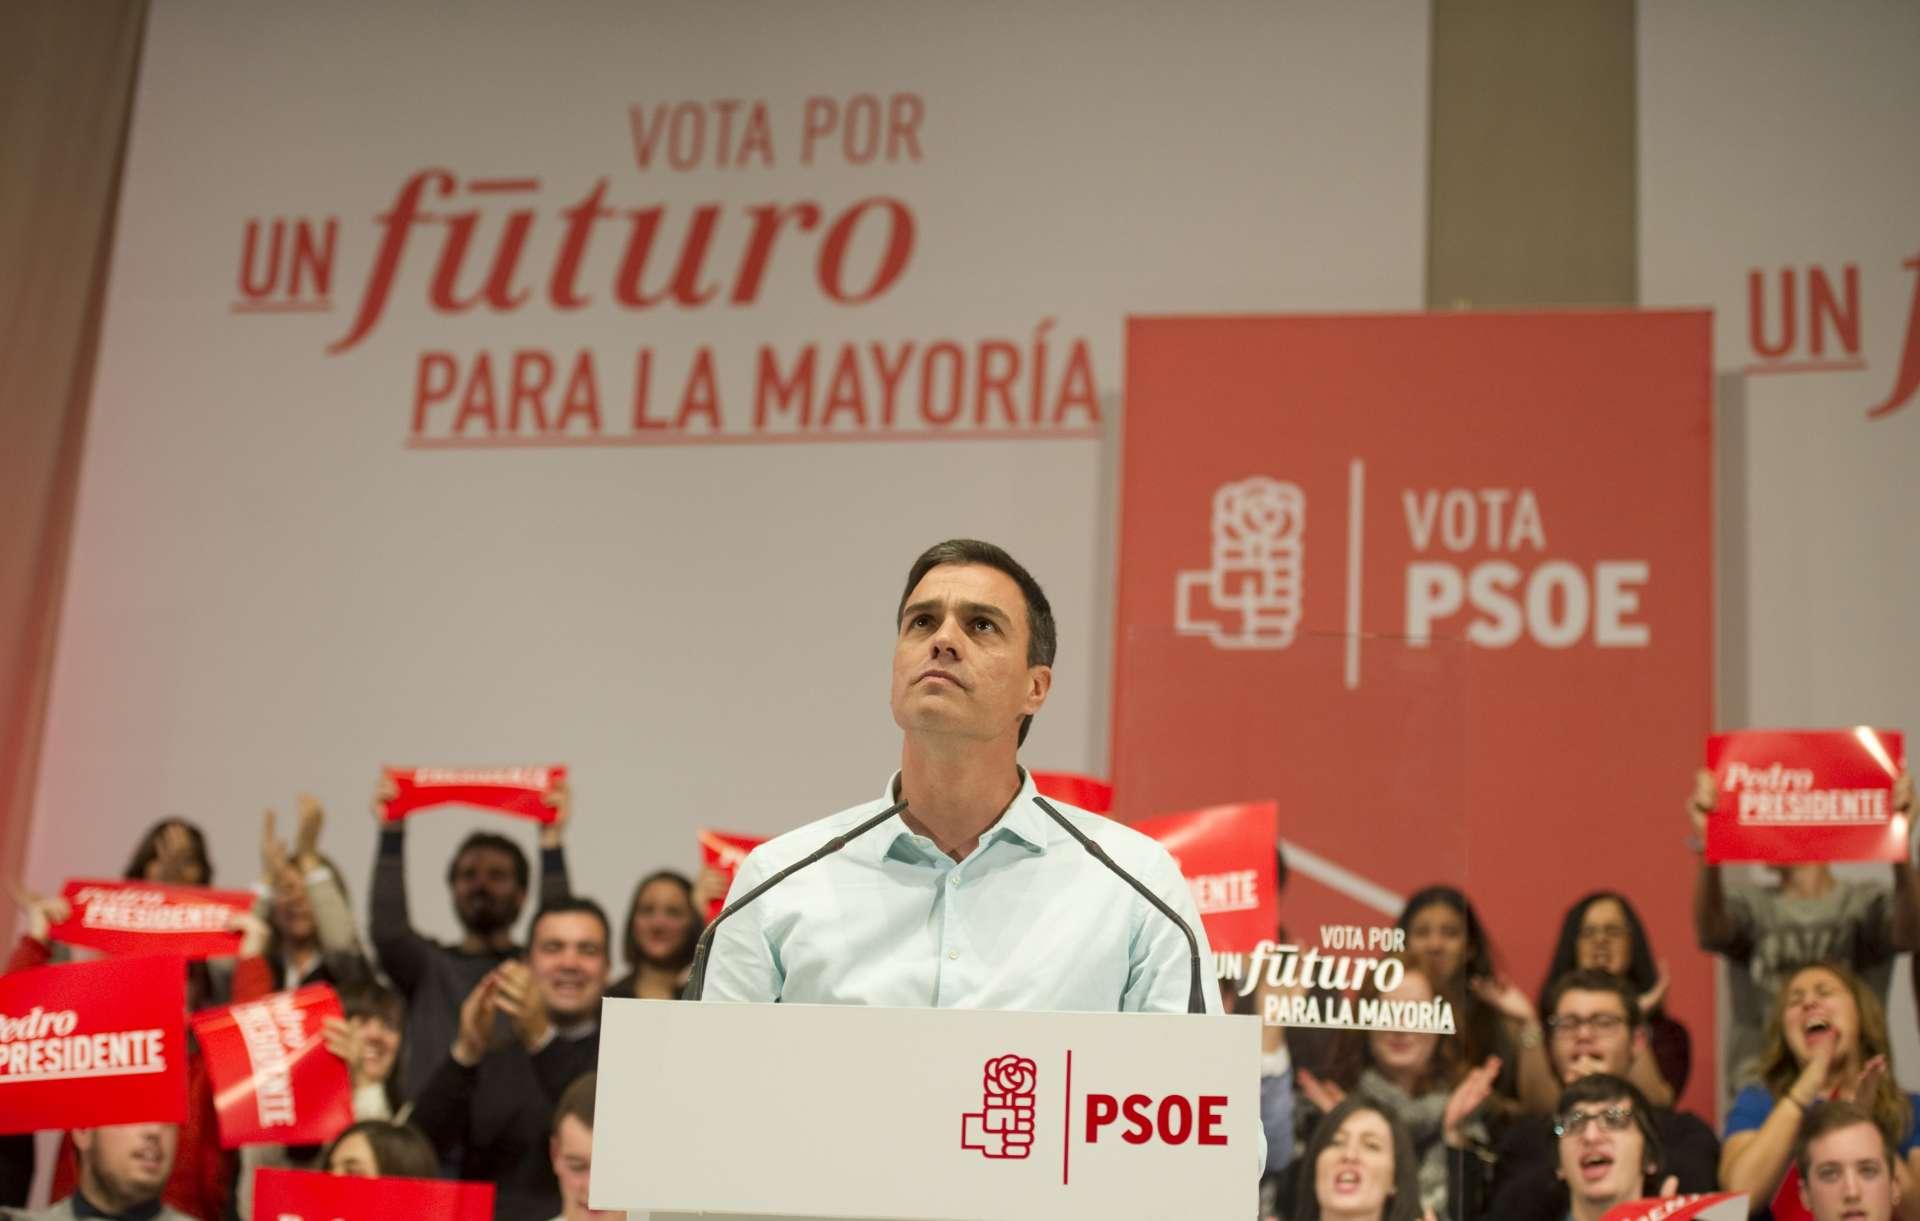 Pedro Sánchez durante un acto de campaña en A Coruña. EP